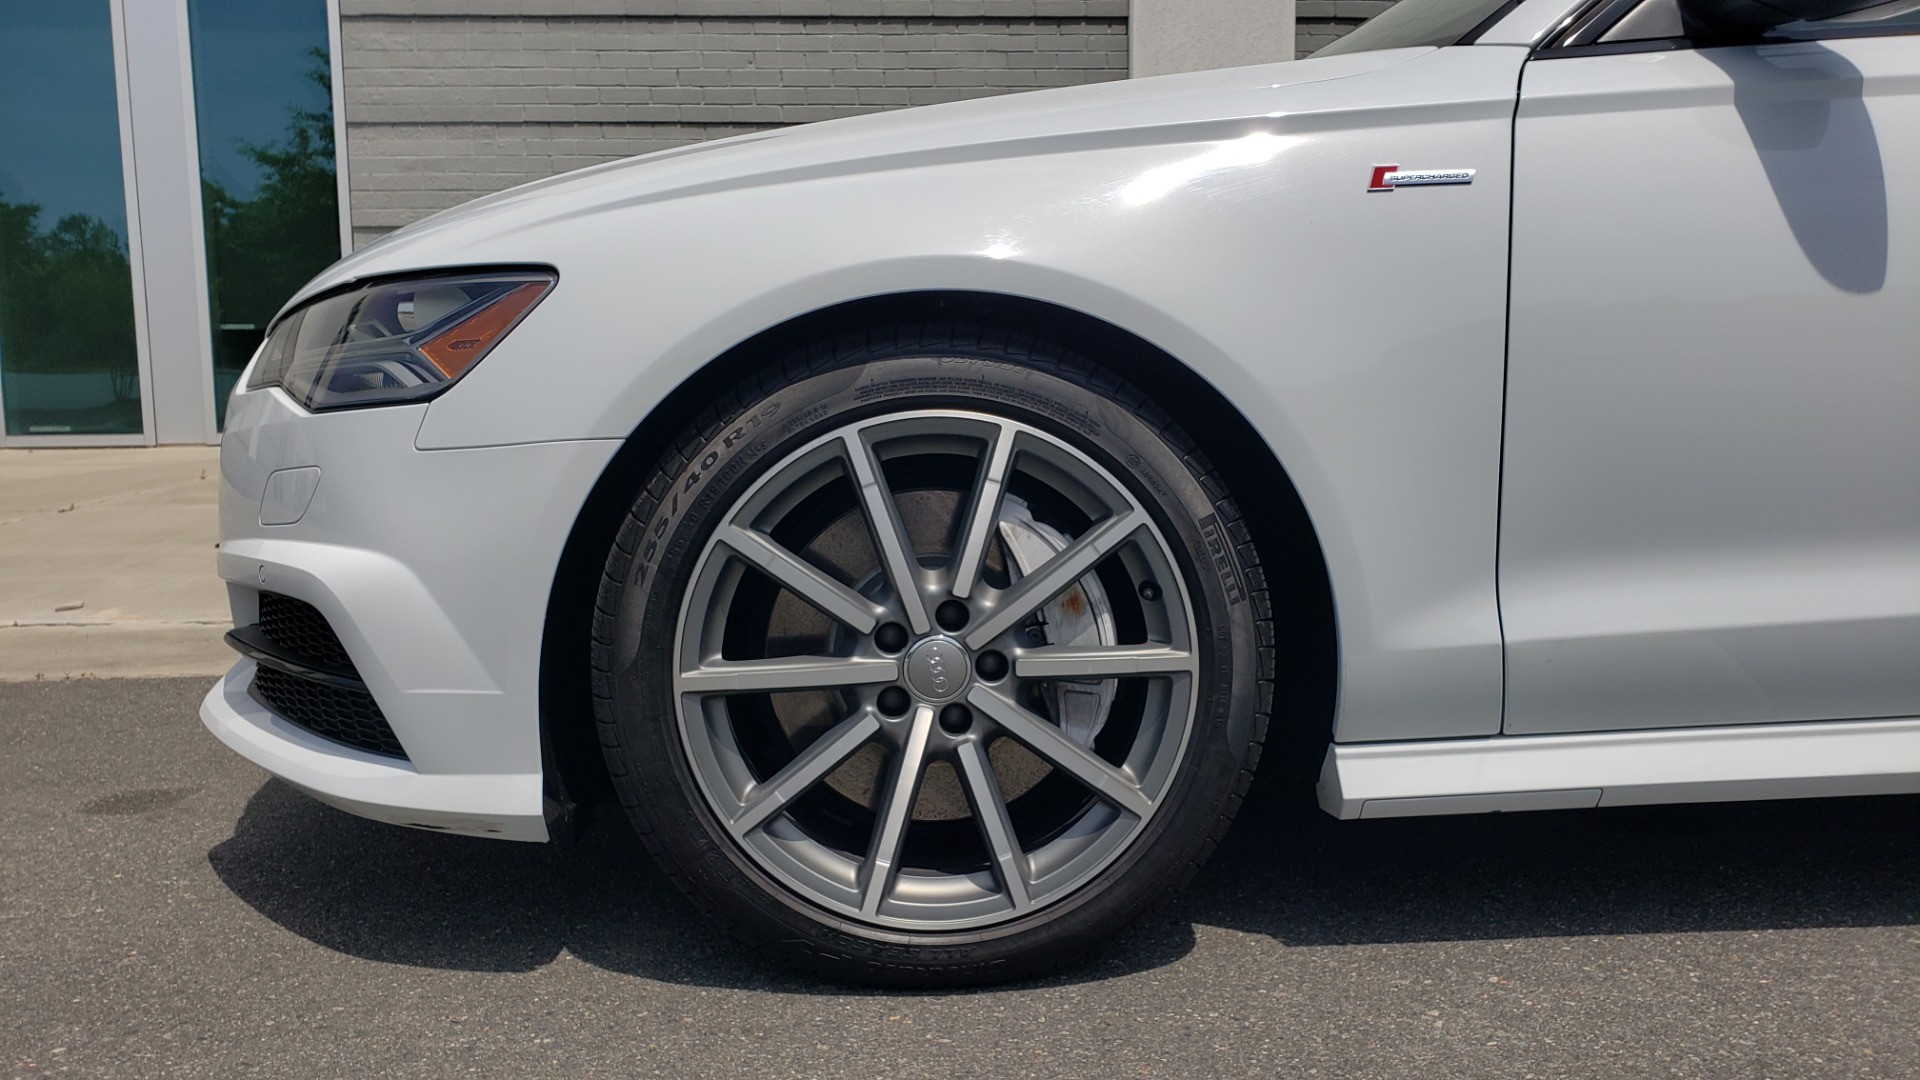 Used 2017 Audi A6 PRESTIGE SEDAN 3.0T / NAV / SUNROOF / BLACK OPTIC / CLD WTHR / REARVIEW for sale $30,797 at Formula Imports in Charlotte NC 28227 82